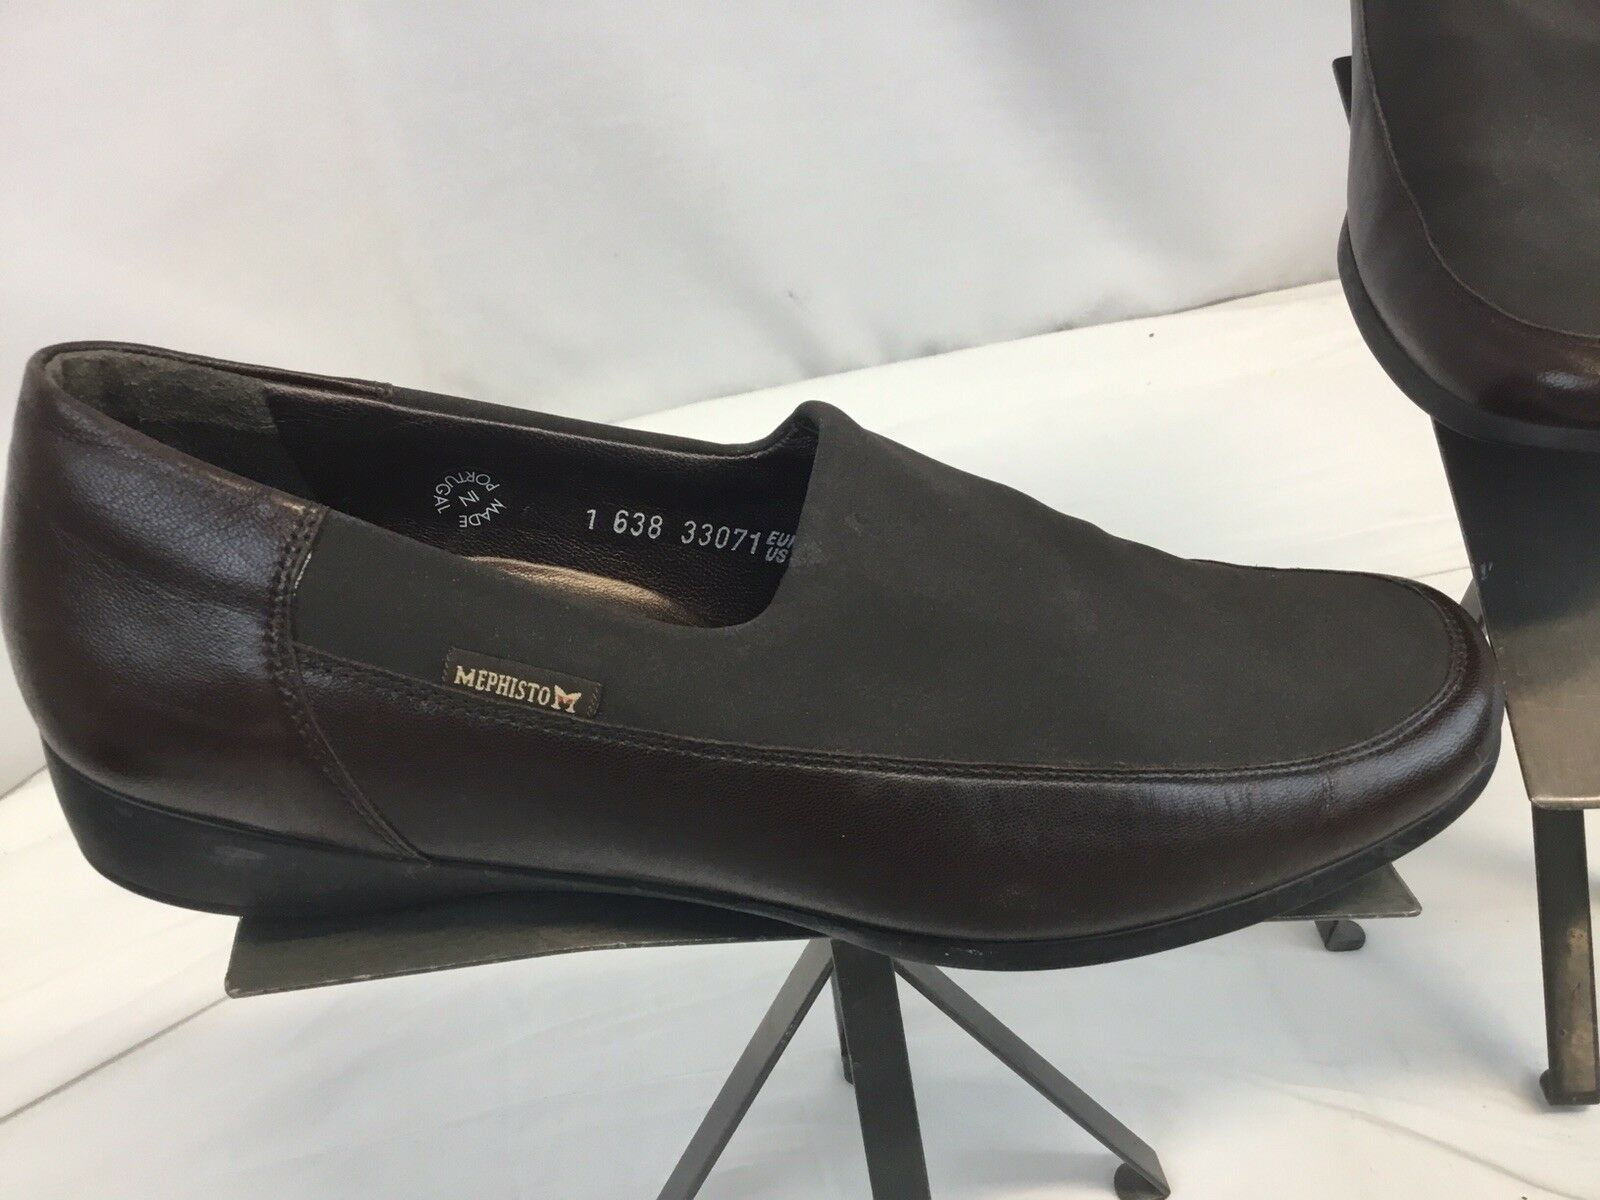 Mephisto schuhe Made Sz 11 damen braun Leather Slip On Made schuhe Portugal Mint YGI L8S-200 dbc42a